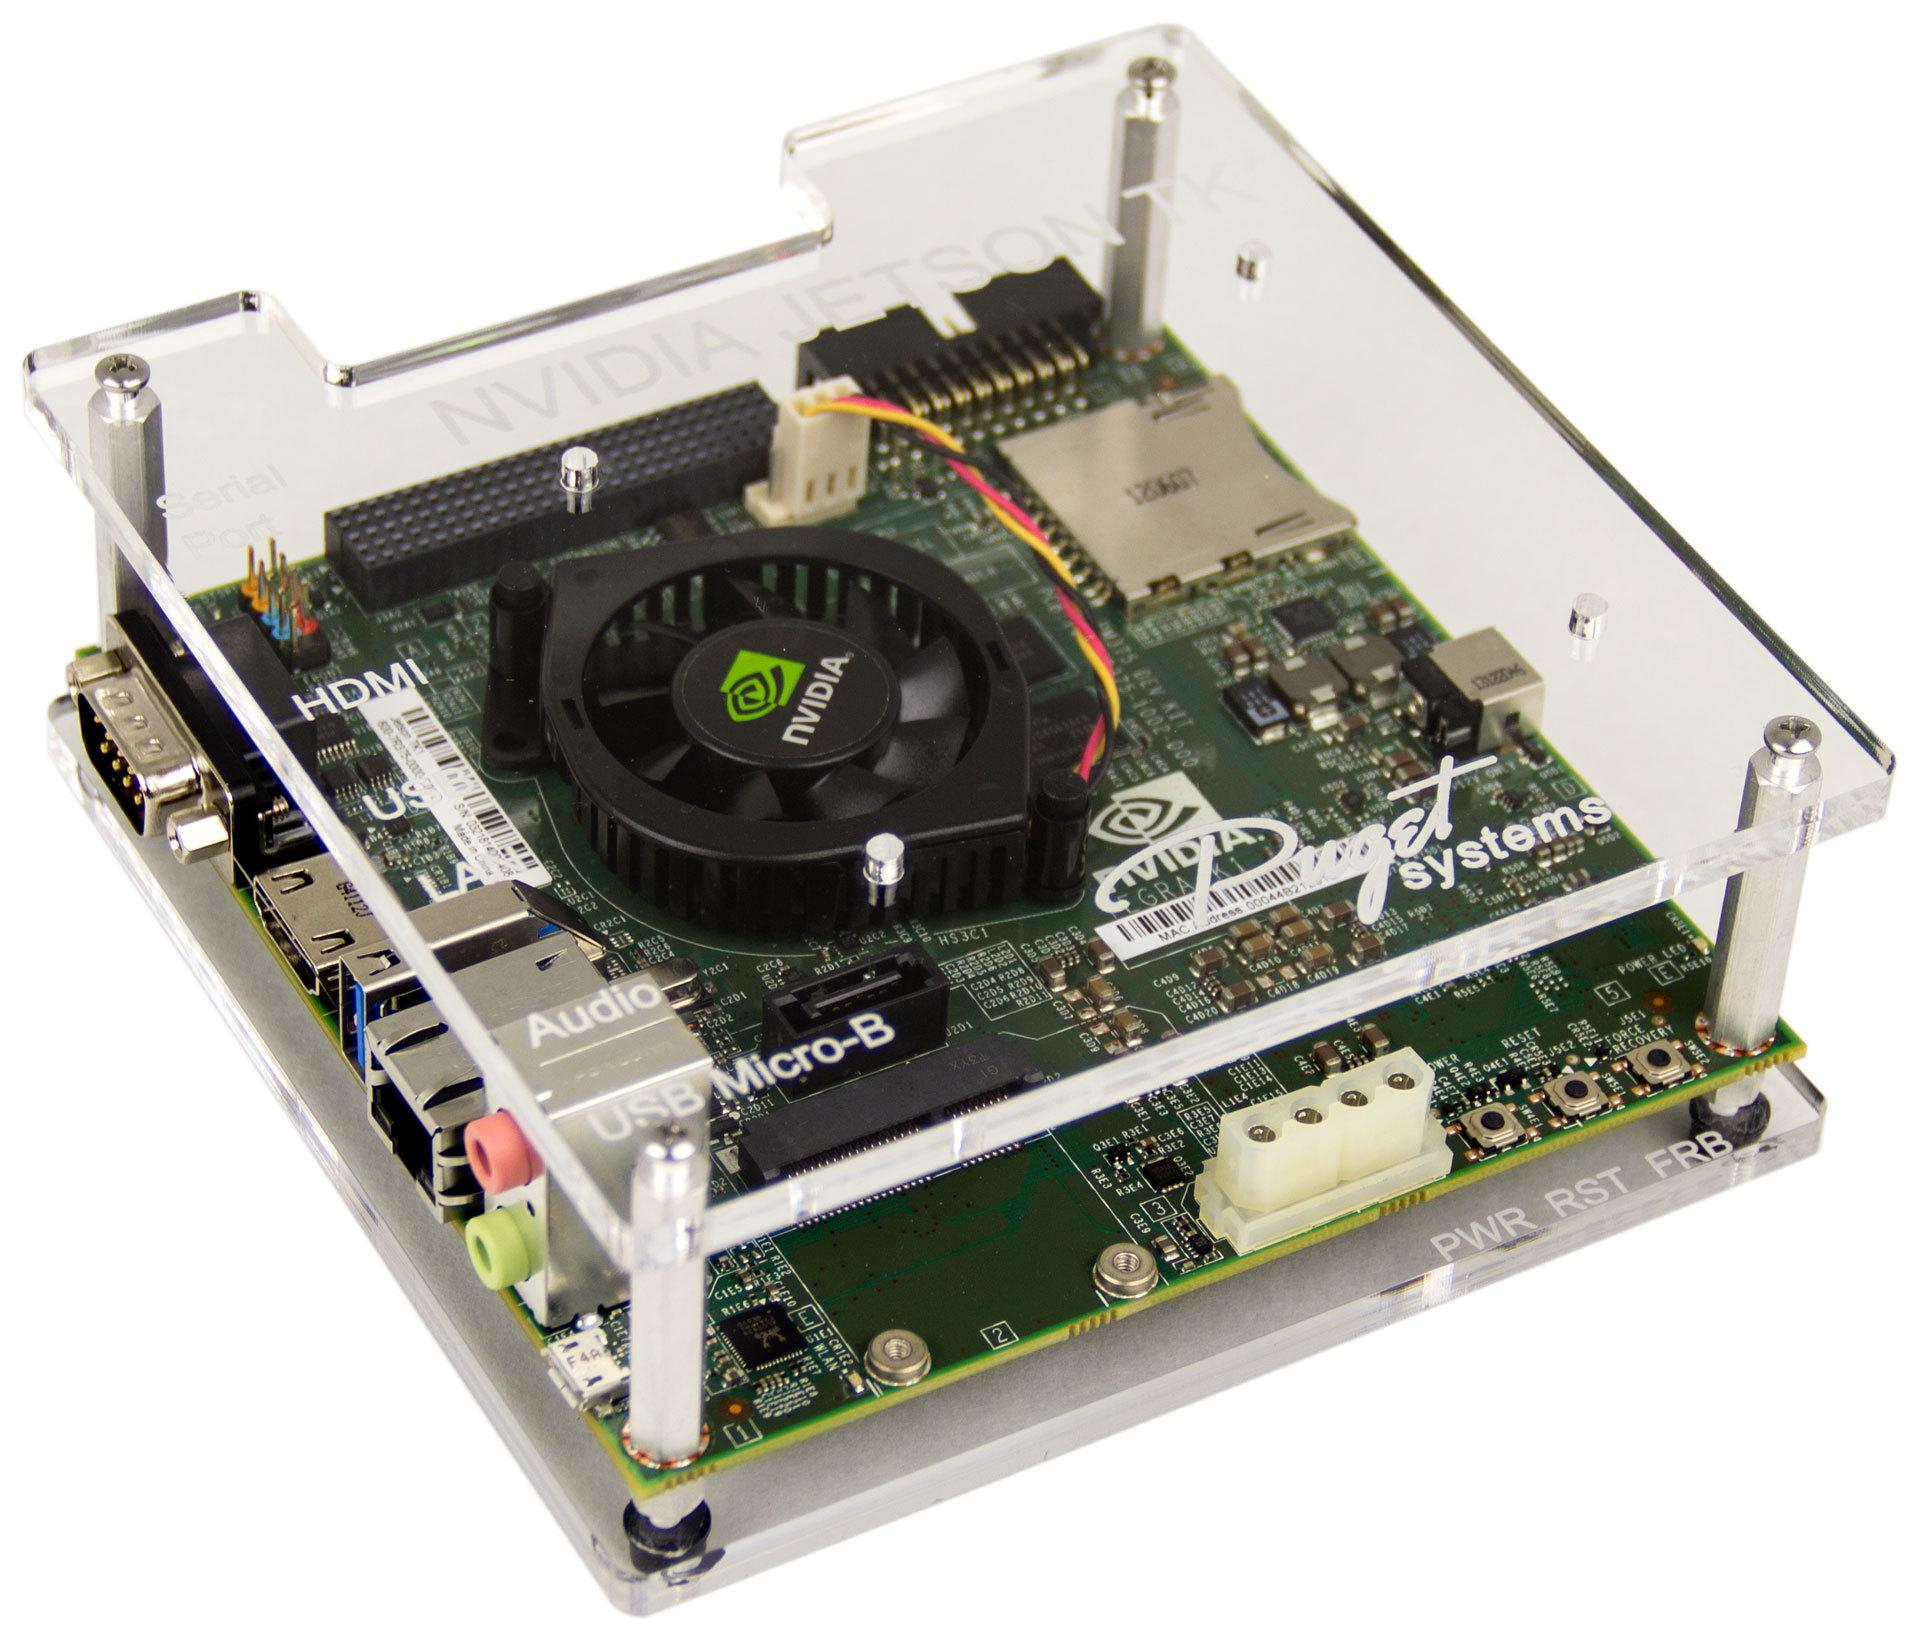 Configure Pc W Puget Systems Acrylic Development